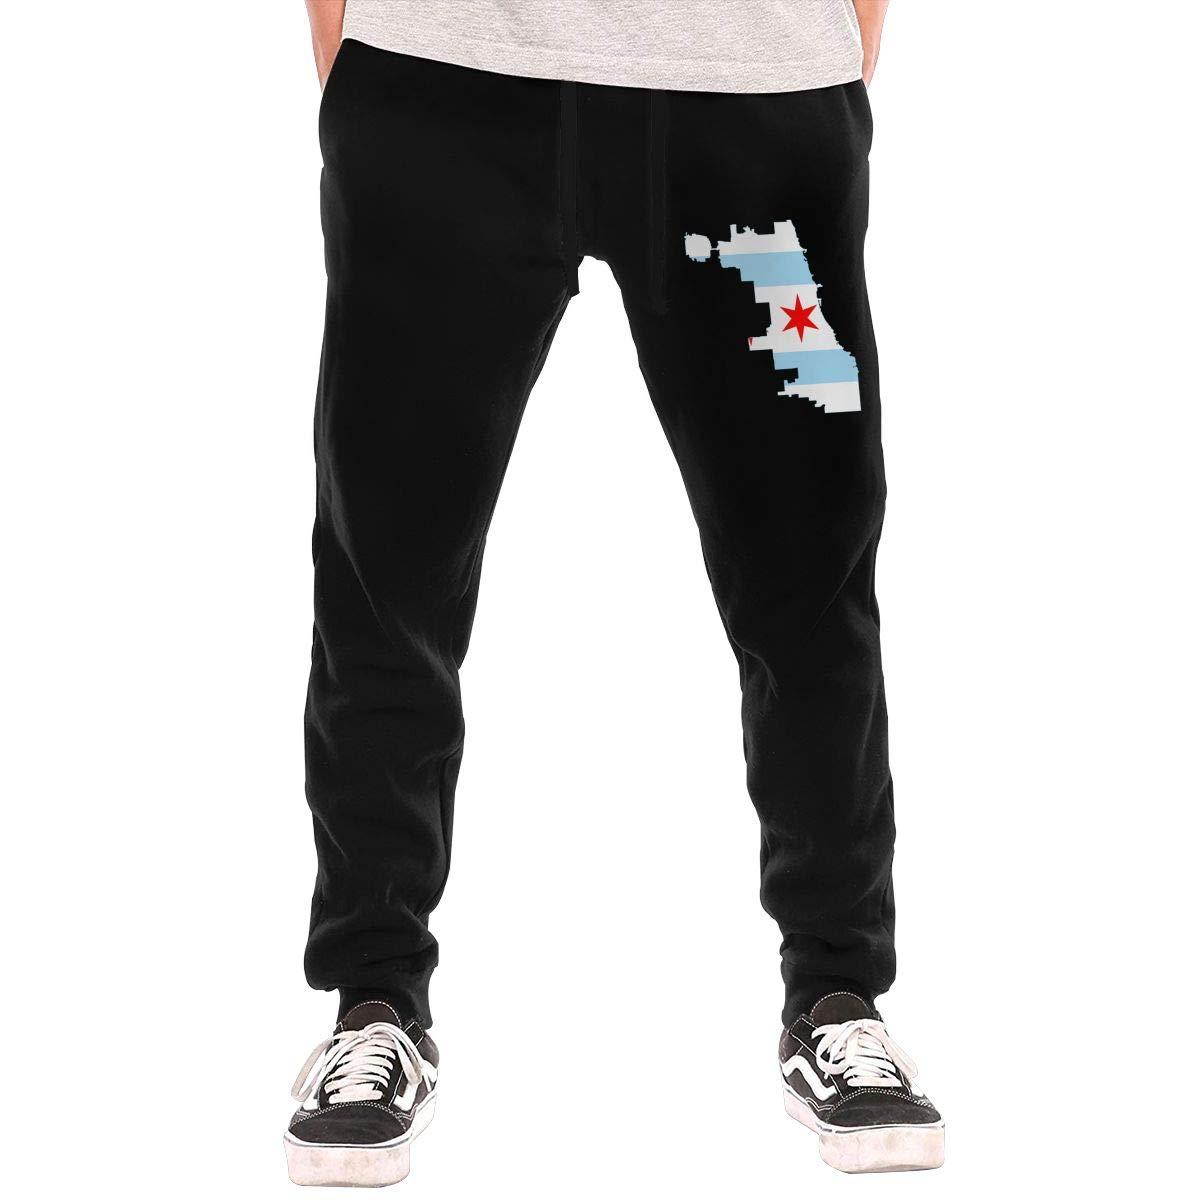 Dbou Chicago Flag Drawstring Waist,100/% Cotton,Elastic Waist Cuffed,Jogger Sweatpants Black